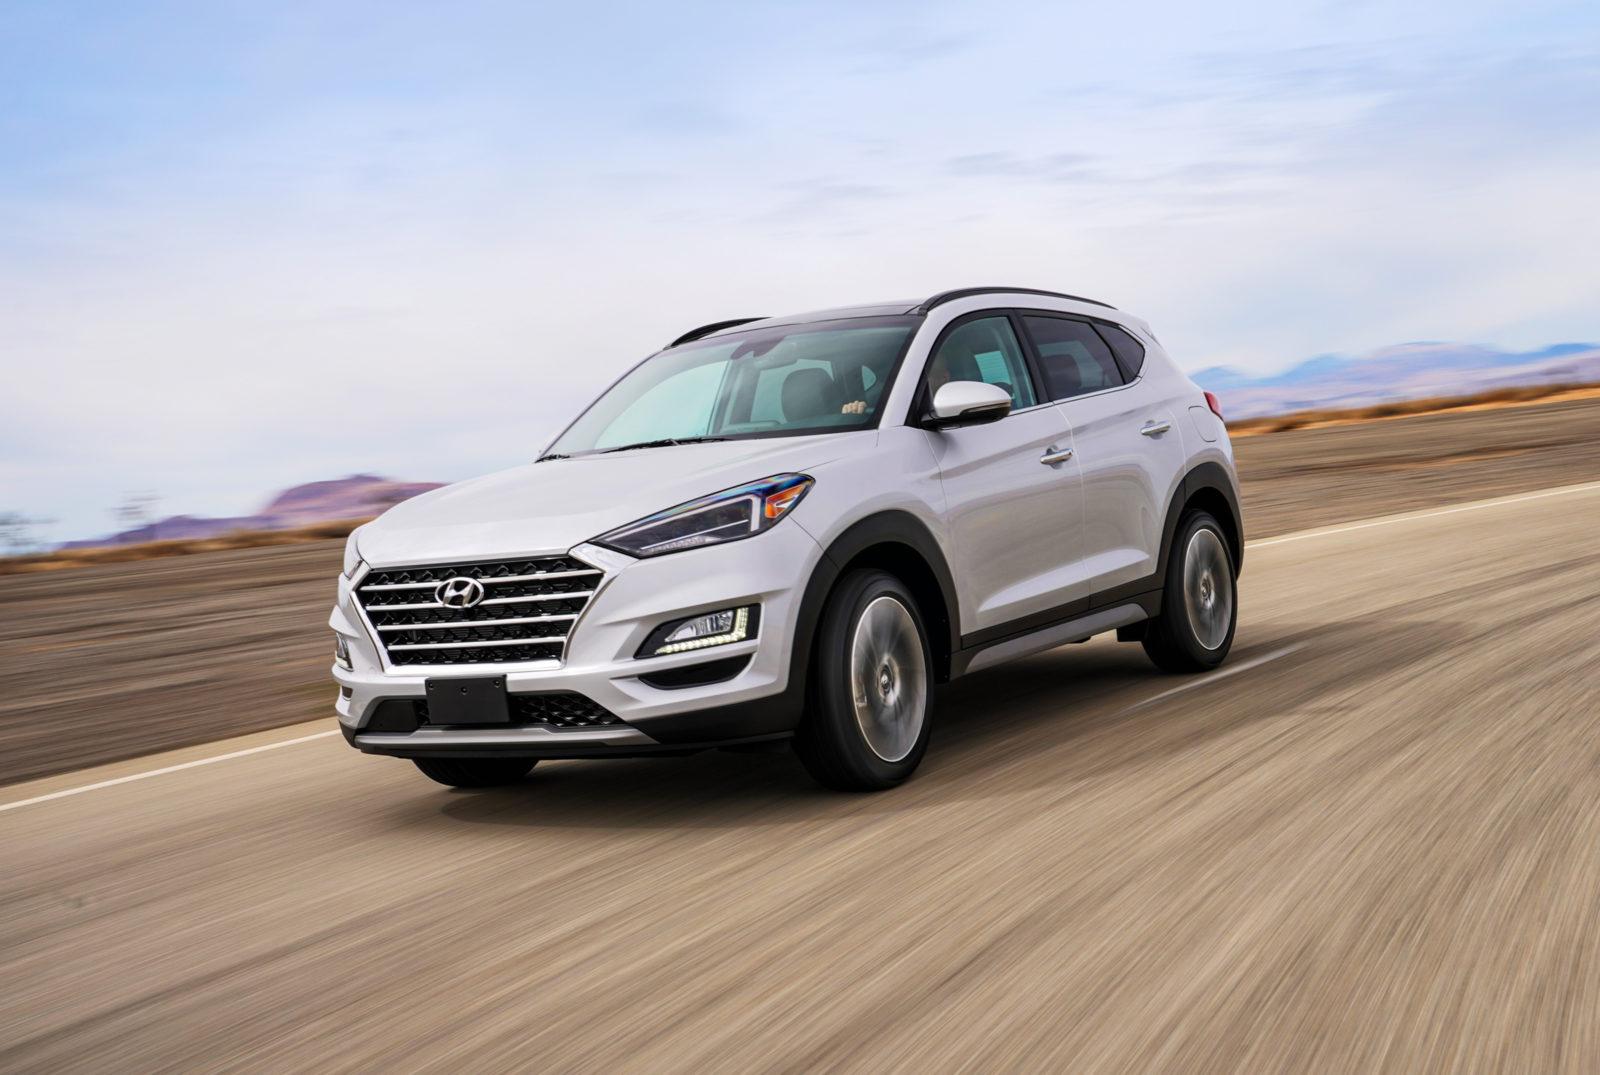 2019 Hyundai Tucson Ultimate FWD Review